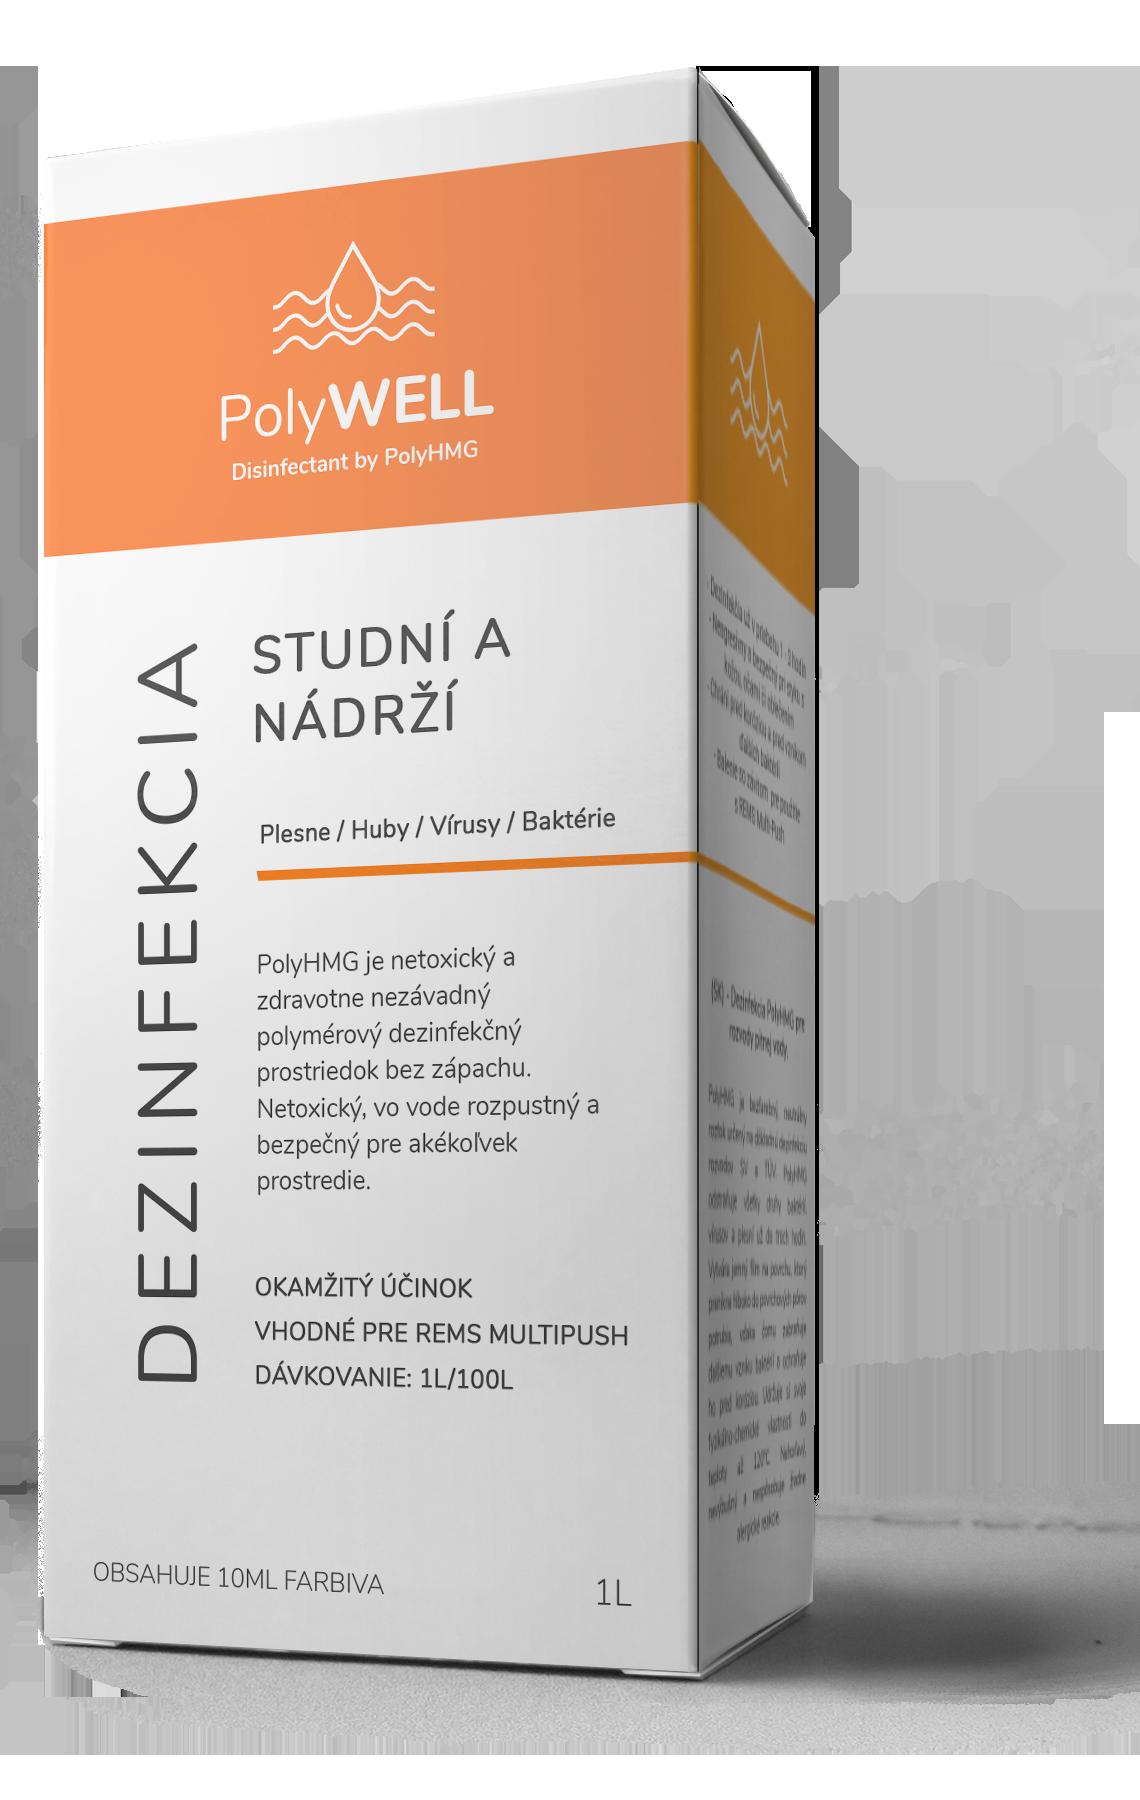 Dezinfekcia PolyHMG - PolyWELL 1l